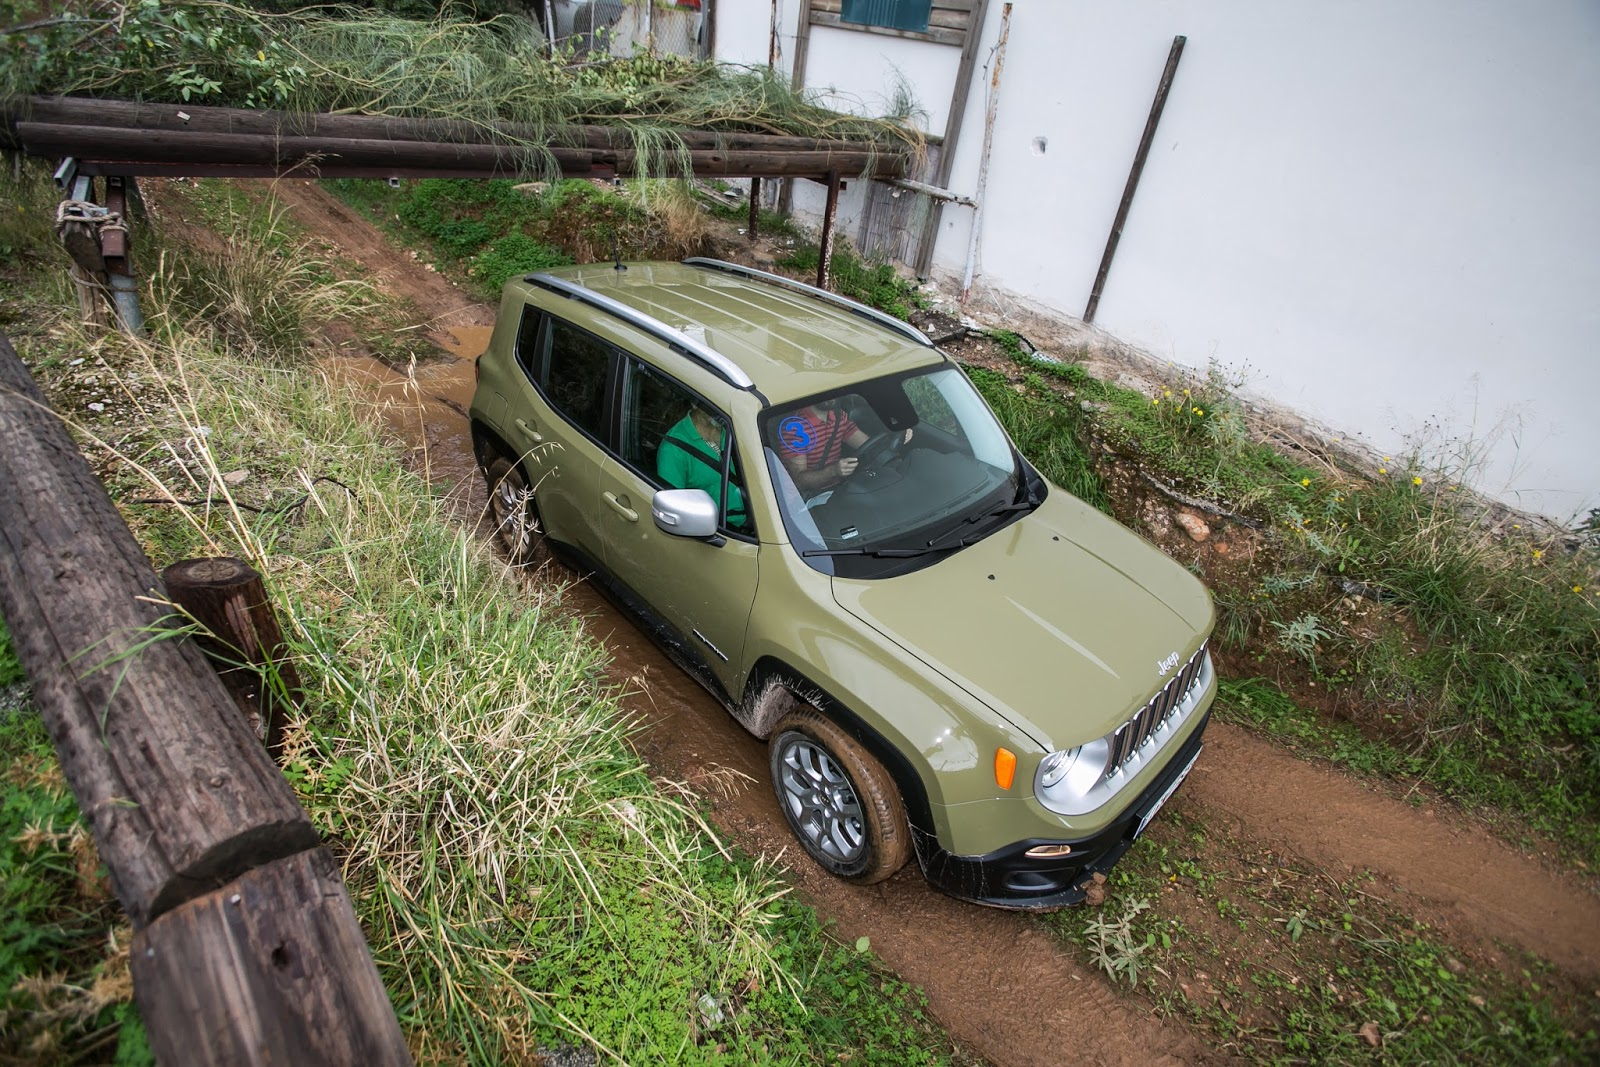 GK 0402 Πετάμε ένα Jeep Renegade σε λάσπες, πέτρες, άμμο, λίμνες. Θα τα καταφέρει;